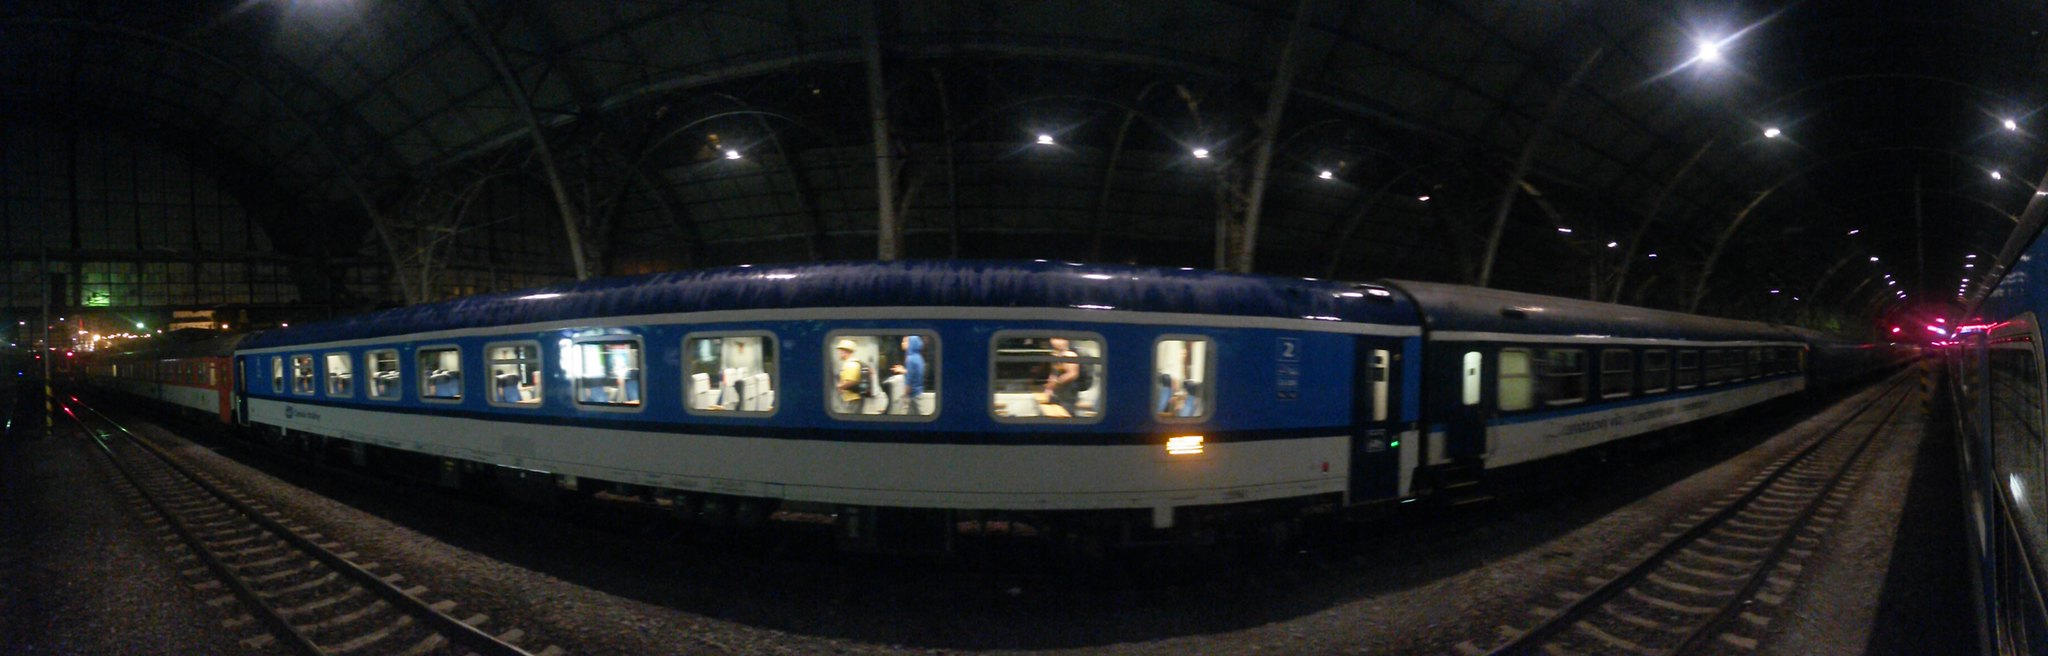 Euronight 477 Metropol From Praha hlavni nadraží to Budapest | by lukvalek